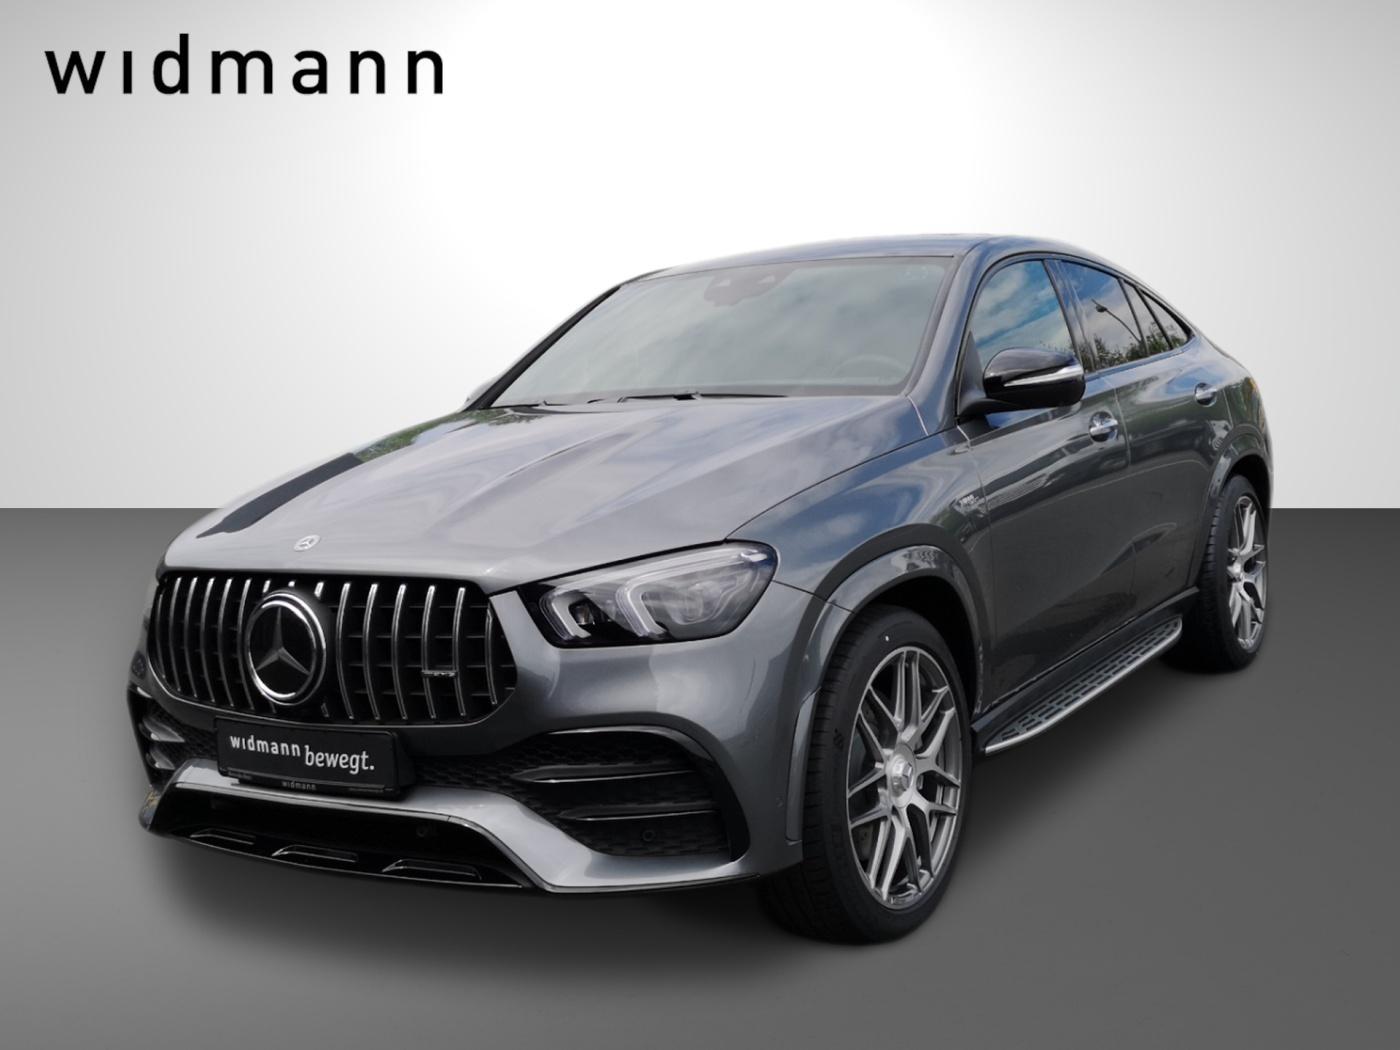 Mercedes-Benz GLE 53 4M+ Coupé EasyP*Burmester*Multibeam*Pano*, Jahr 2021, Benzin